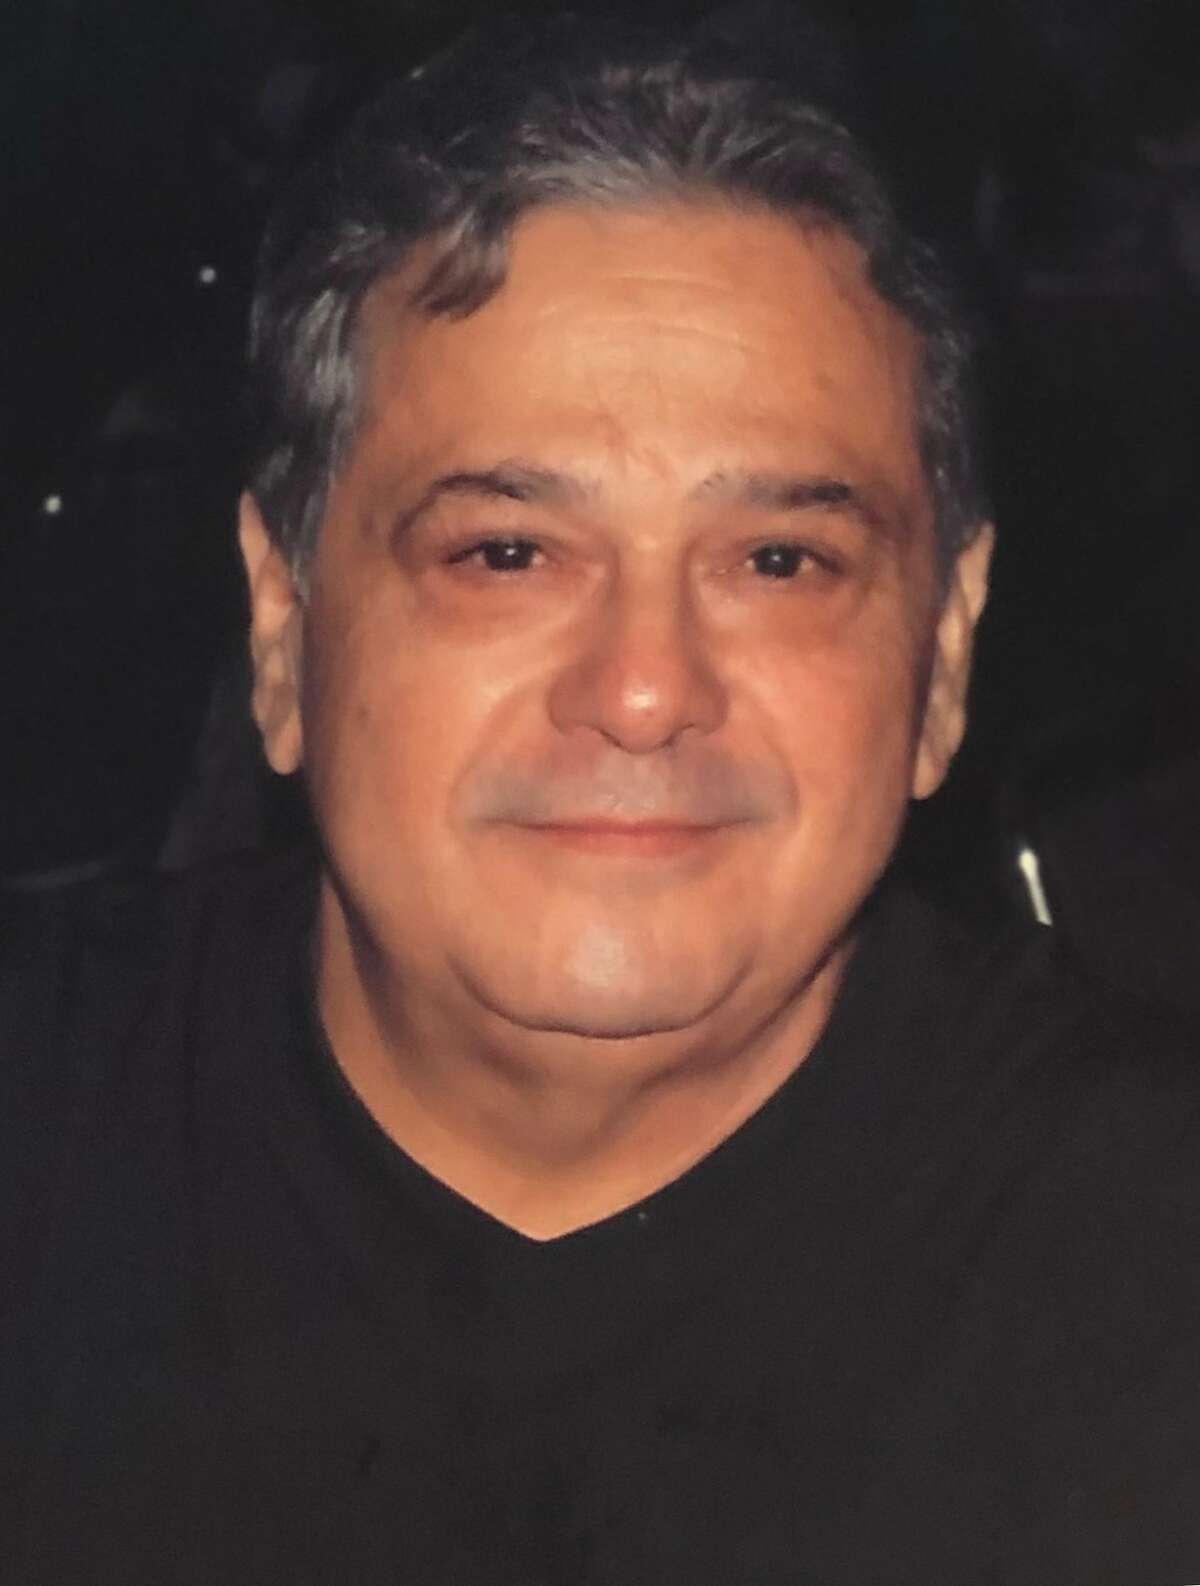 Omar Guevara